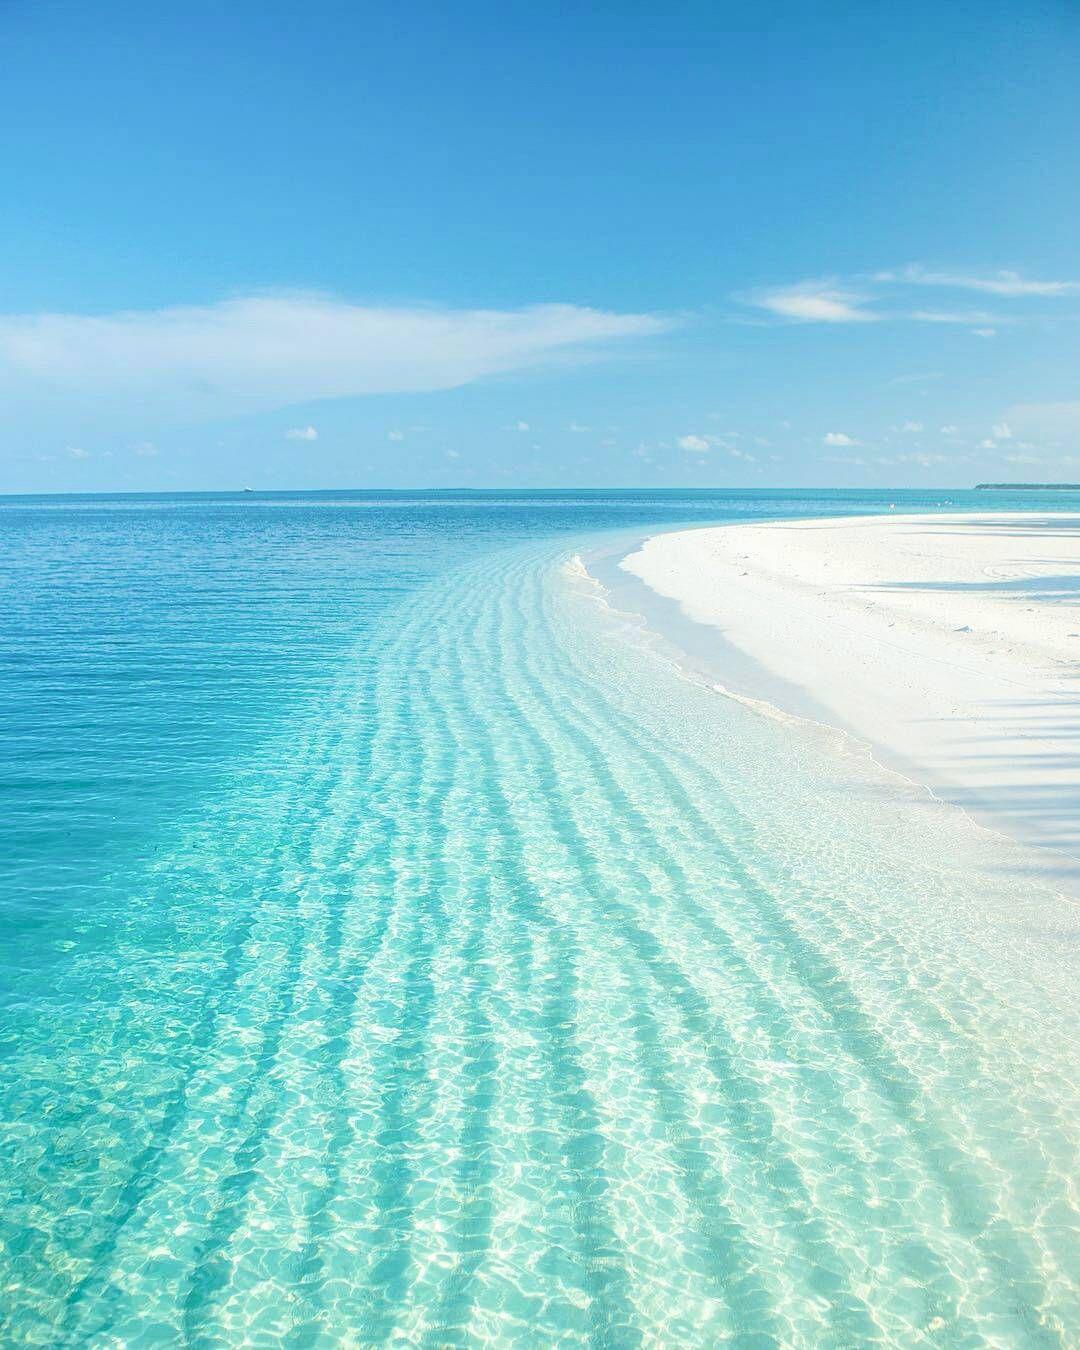 Ocean Beach: The Maldives Islands #Maldives In 2019